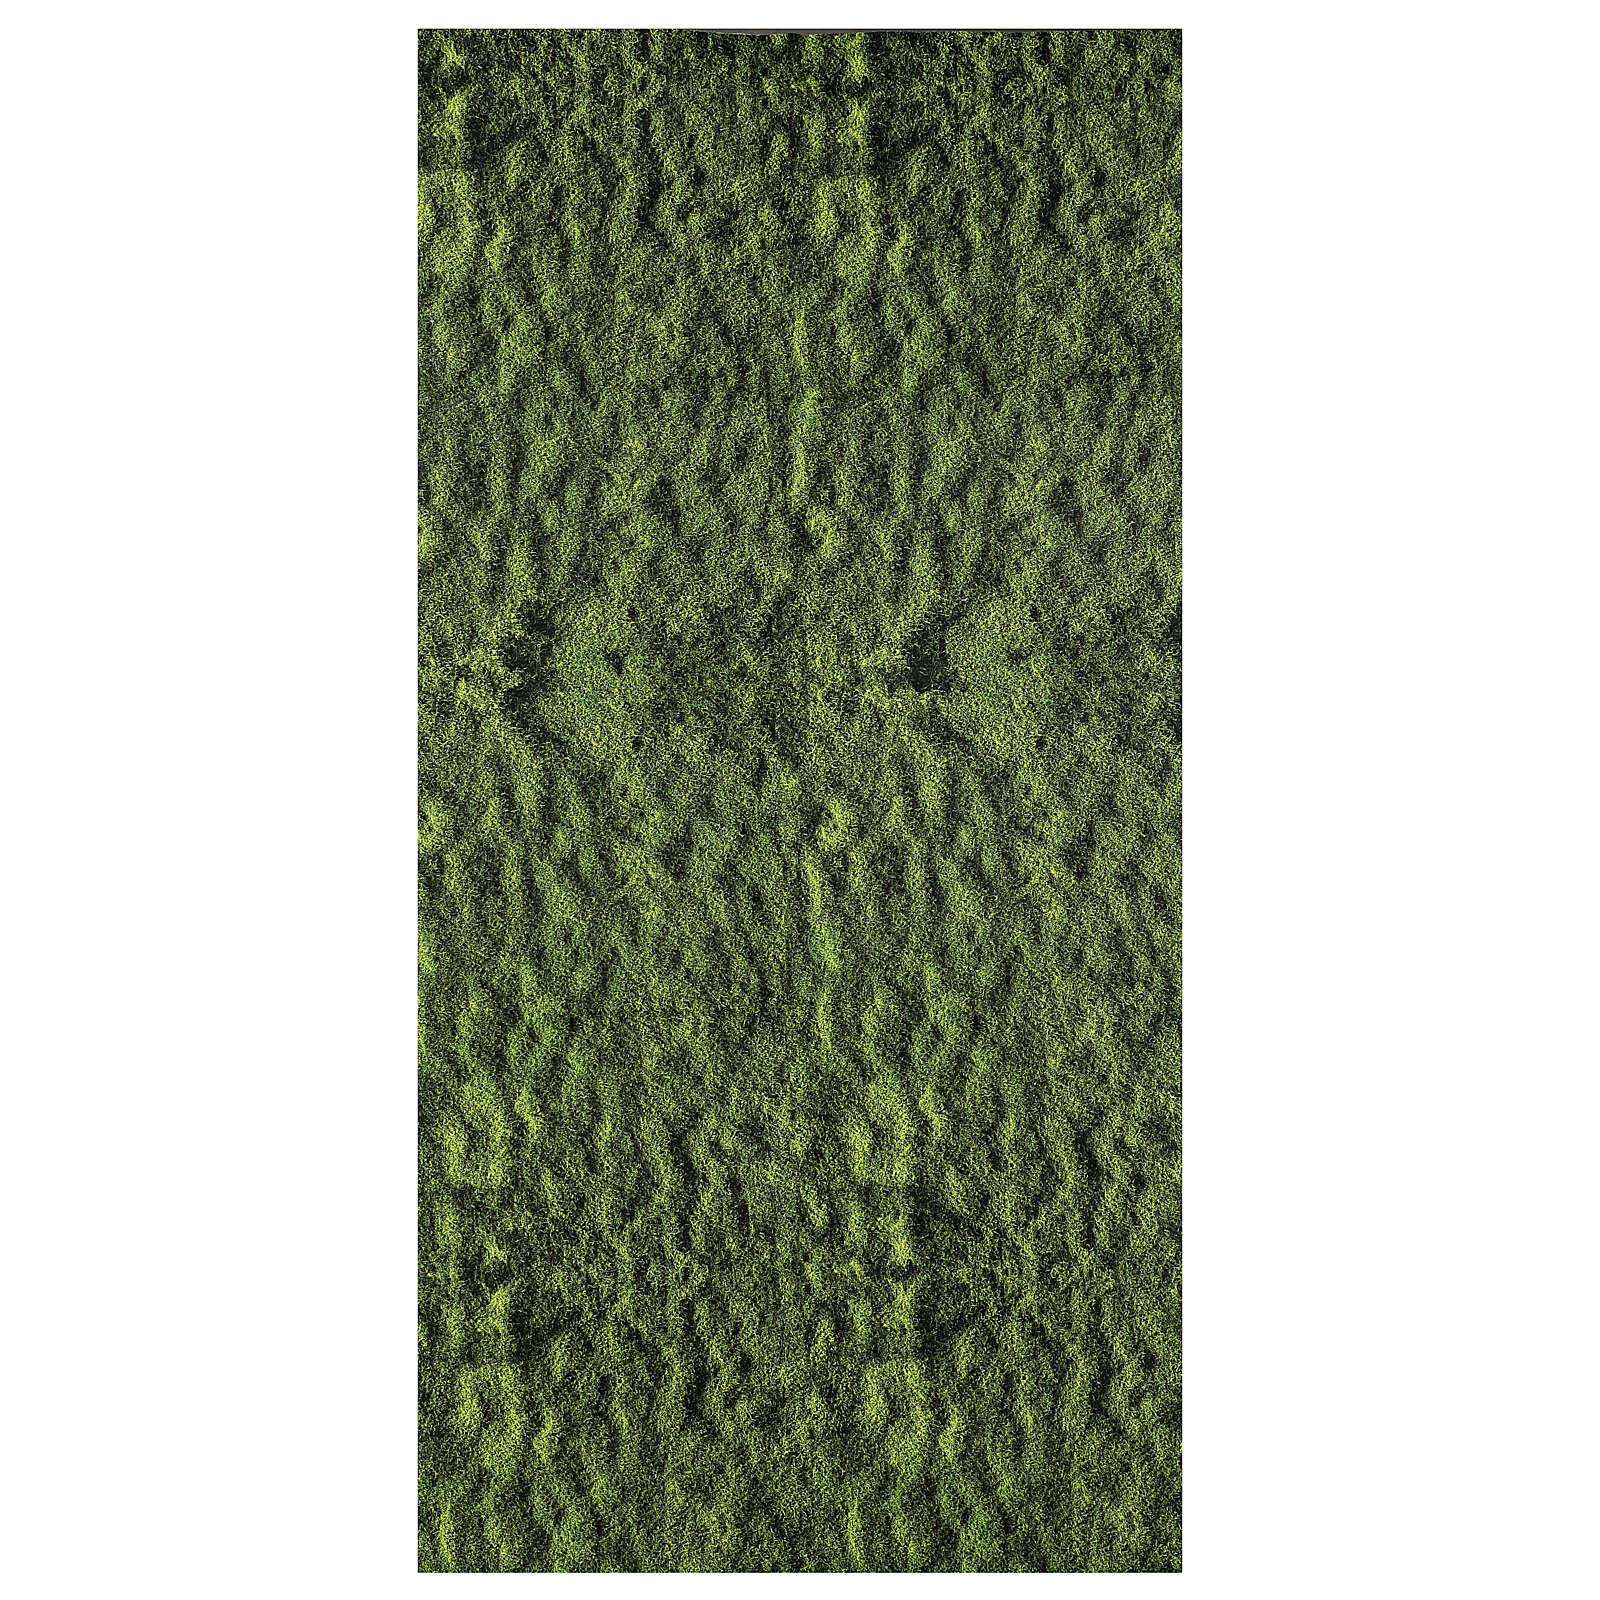 Carta muschio modellabile per presepe 120x60 cm 4